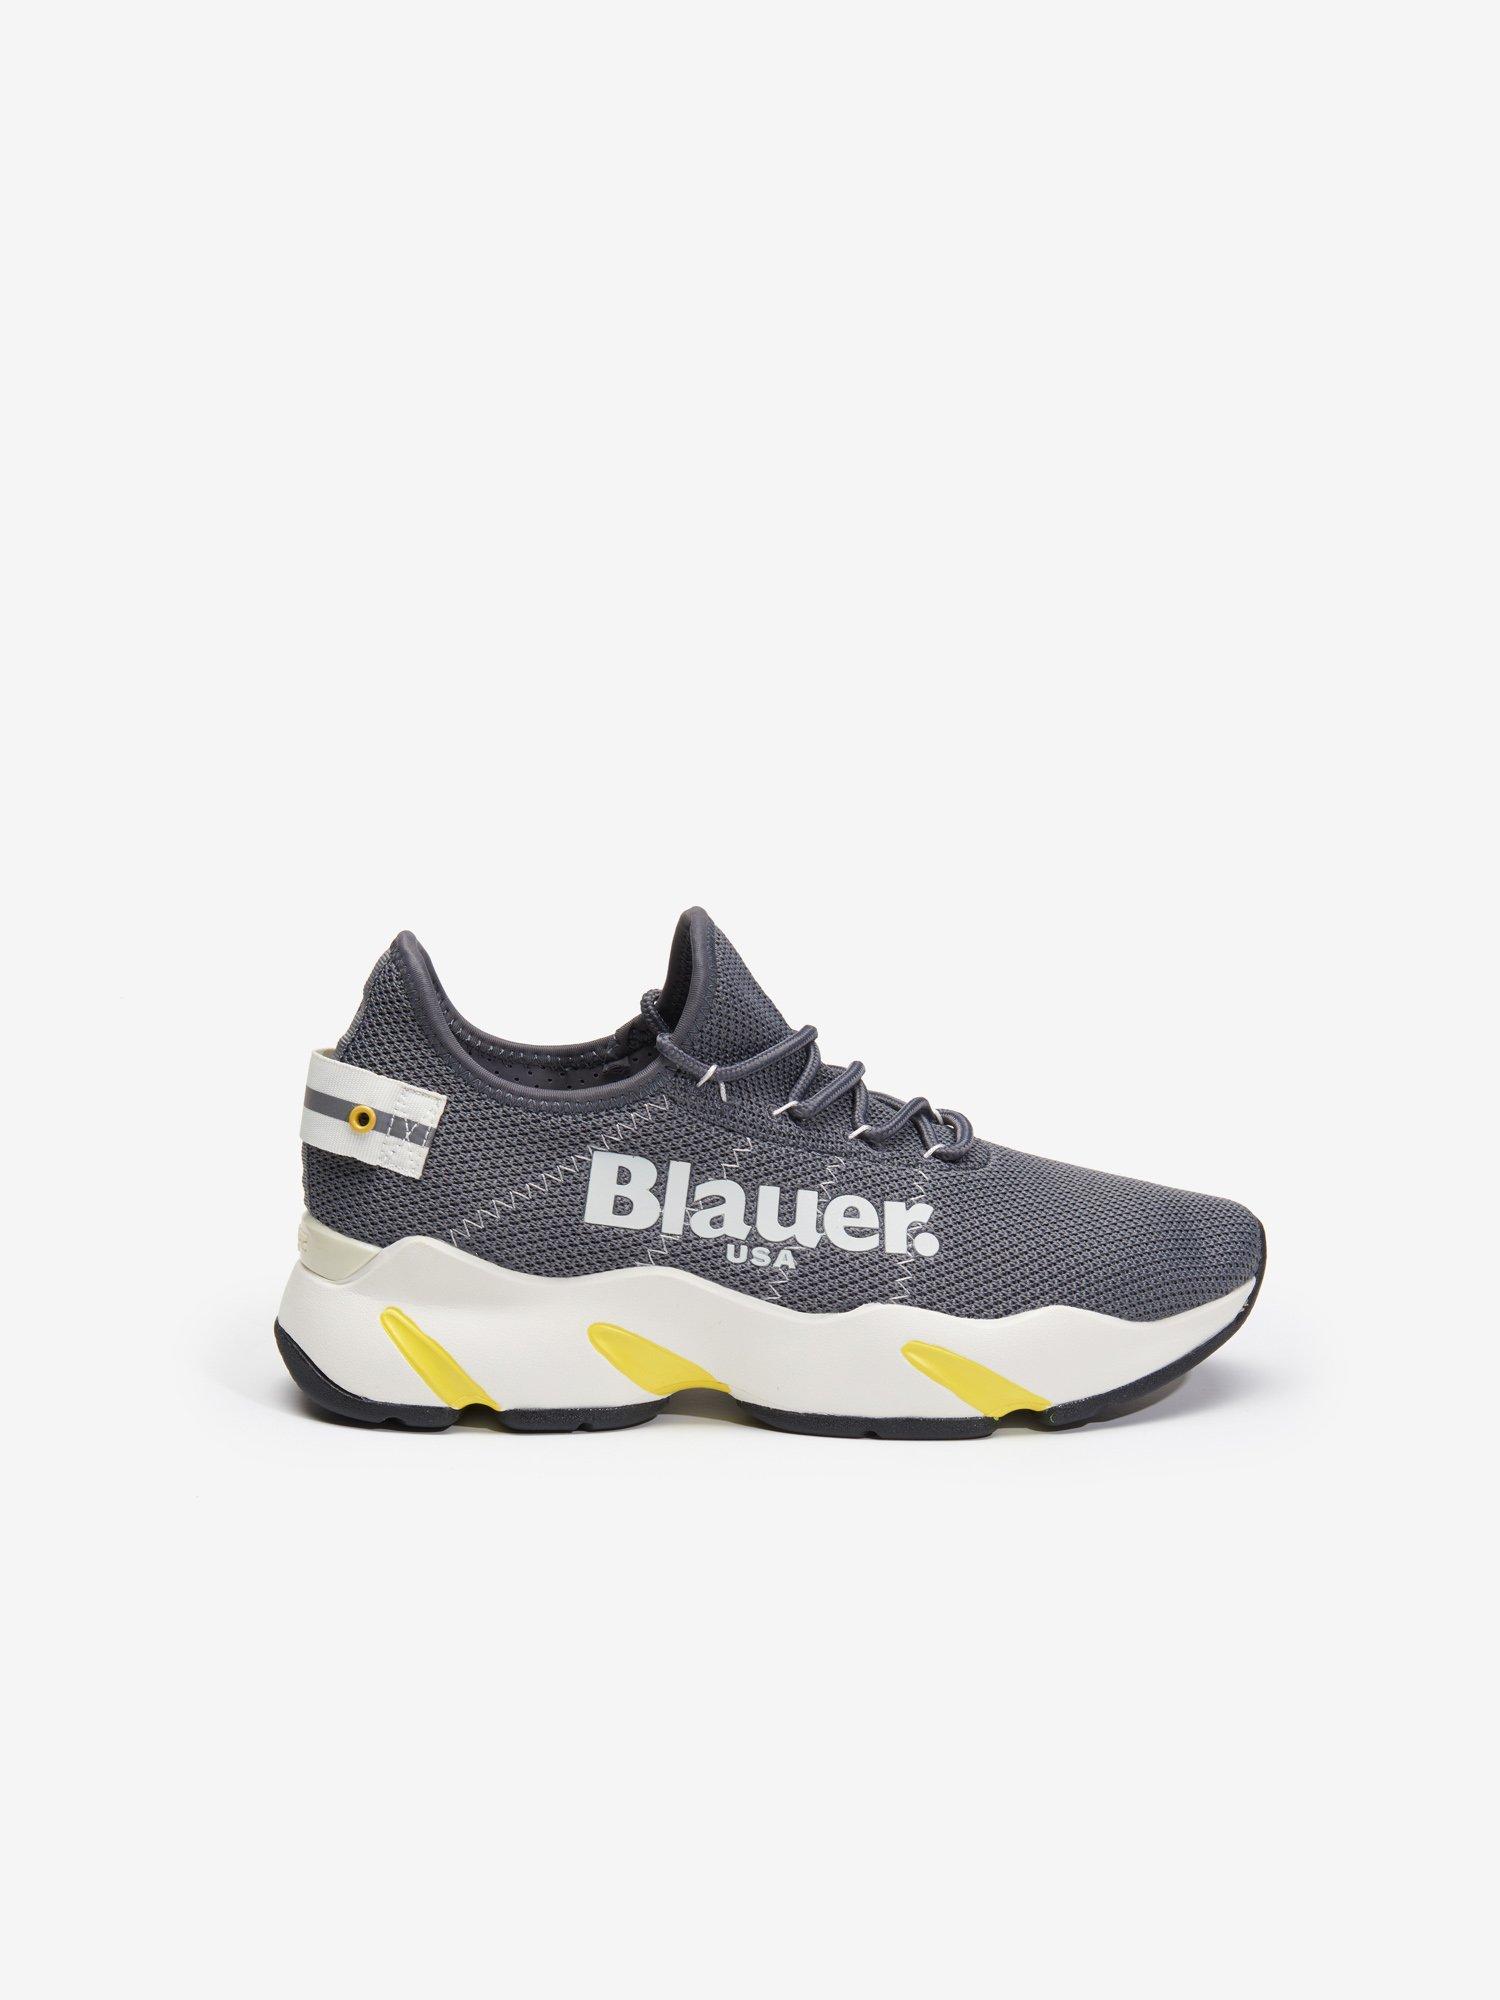 check out 92d74 048b6 Blauer - MAUI MESH - Mouse Grey - 1 ...